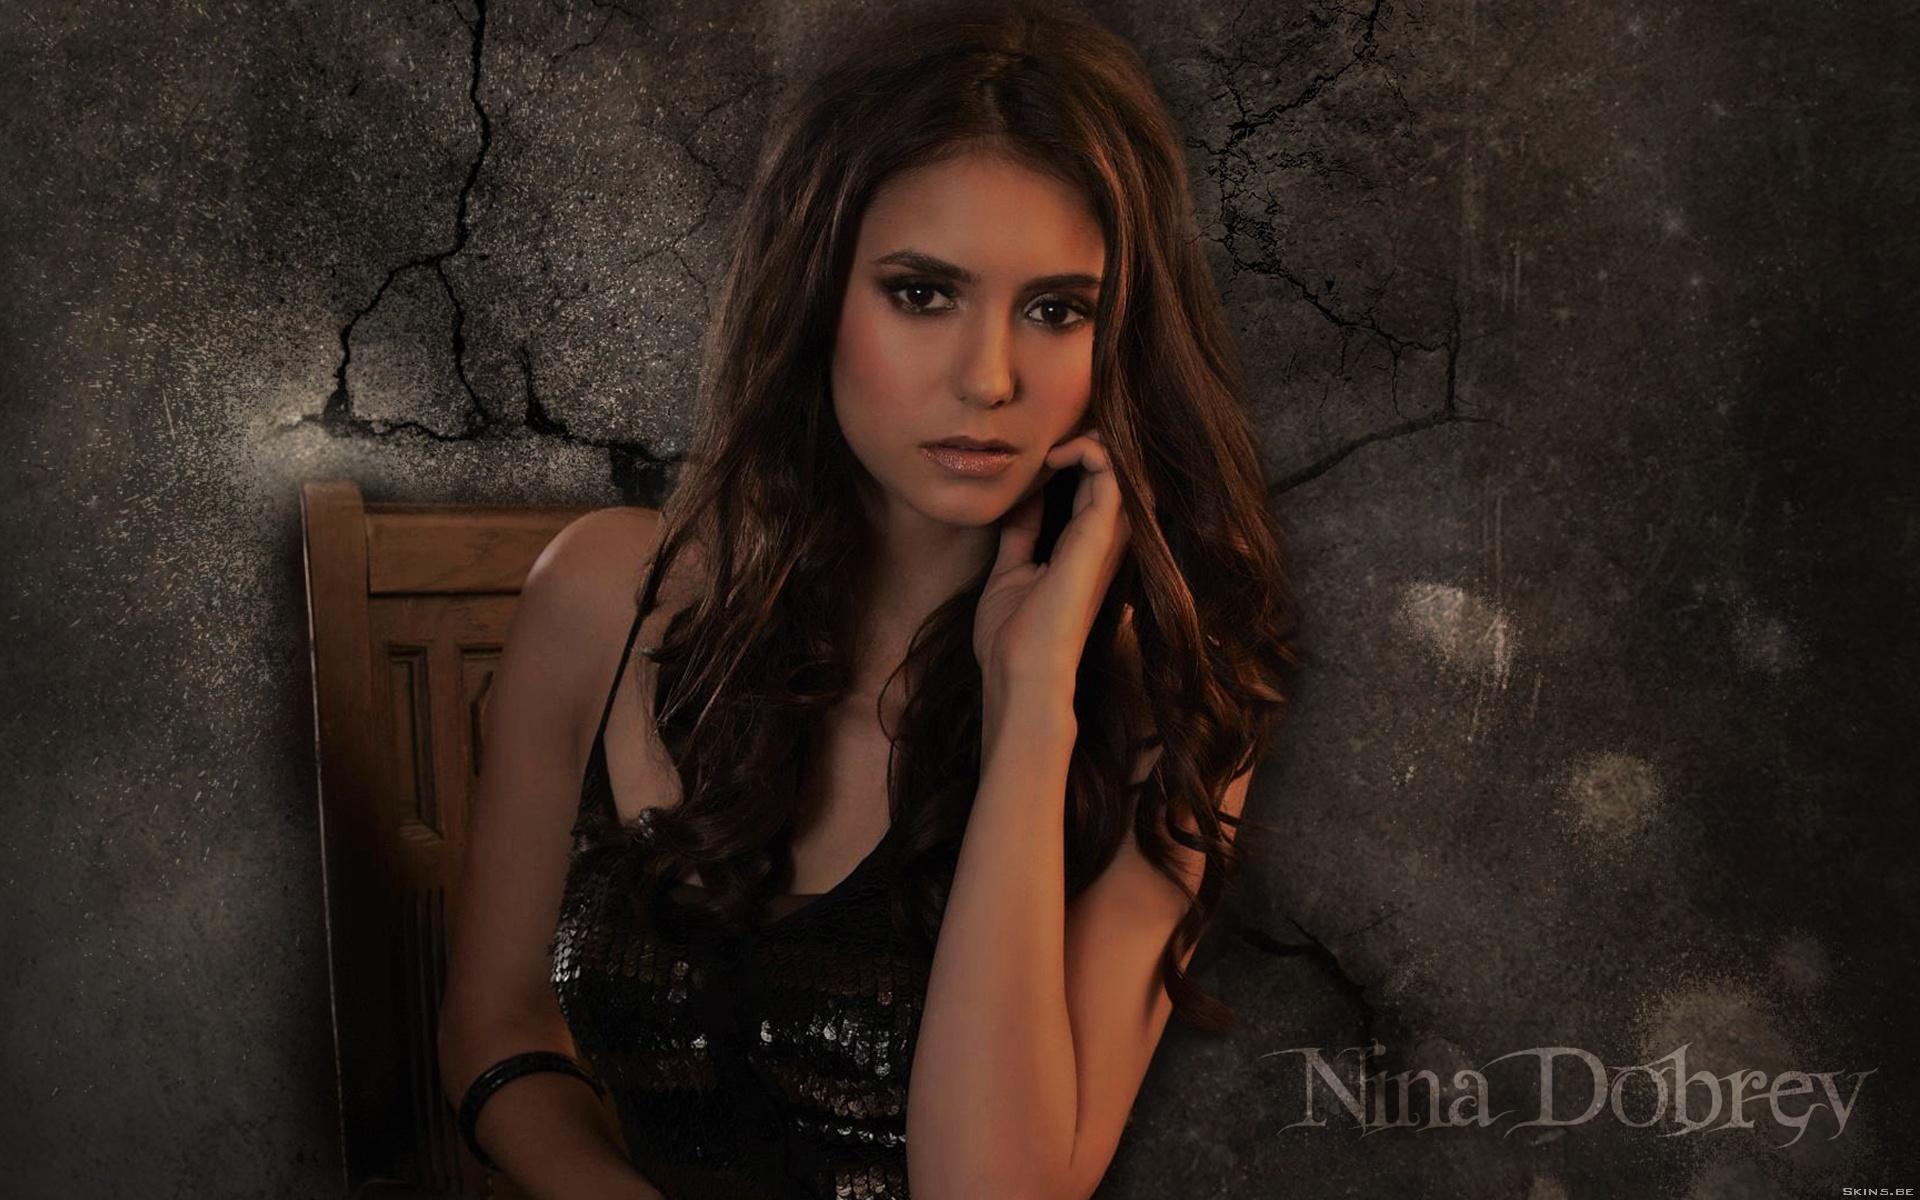 Vampire Diaries Hd Wallpapers 1366x768 Nina Dobrev Hd Wallpaper Background Image 1920x1200